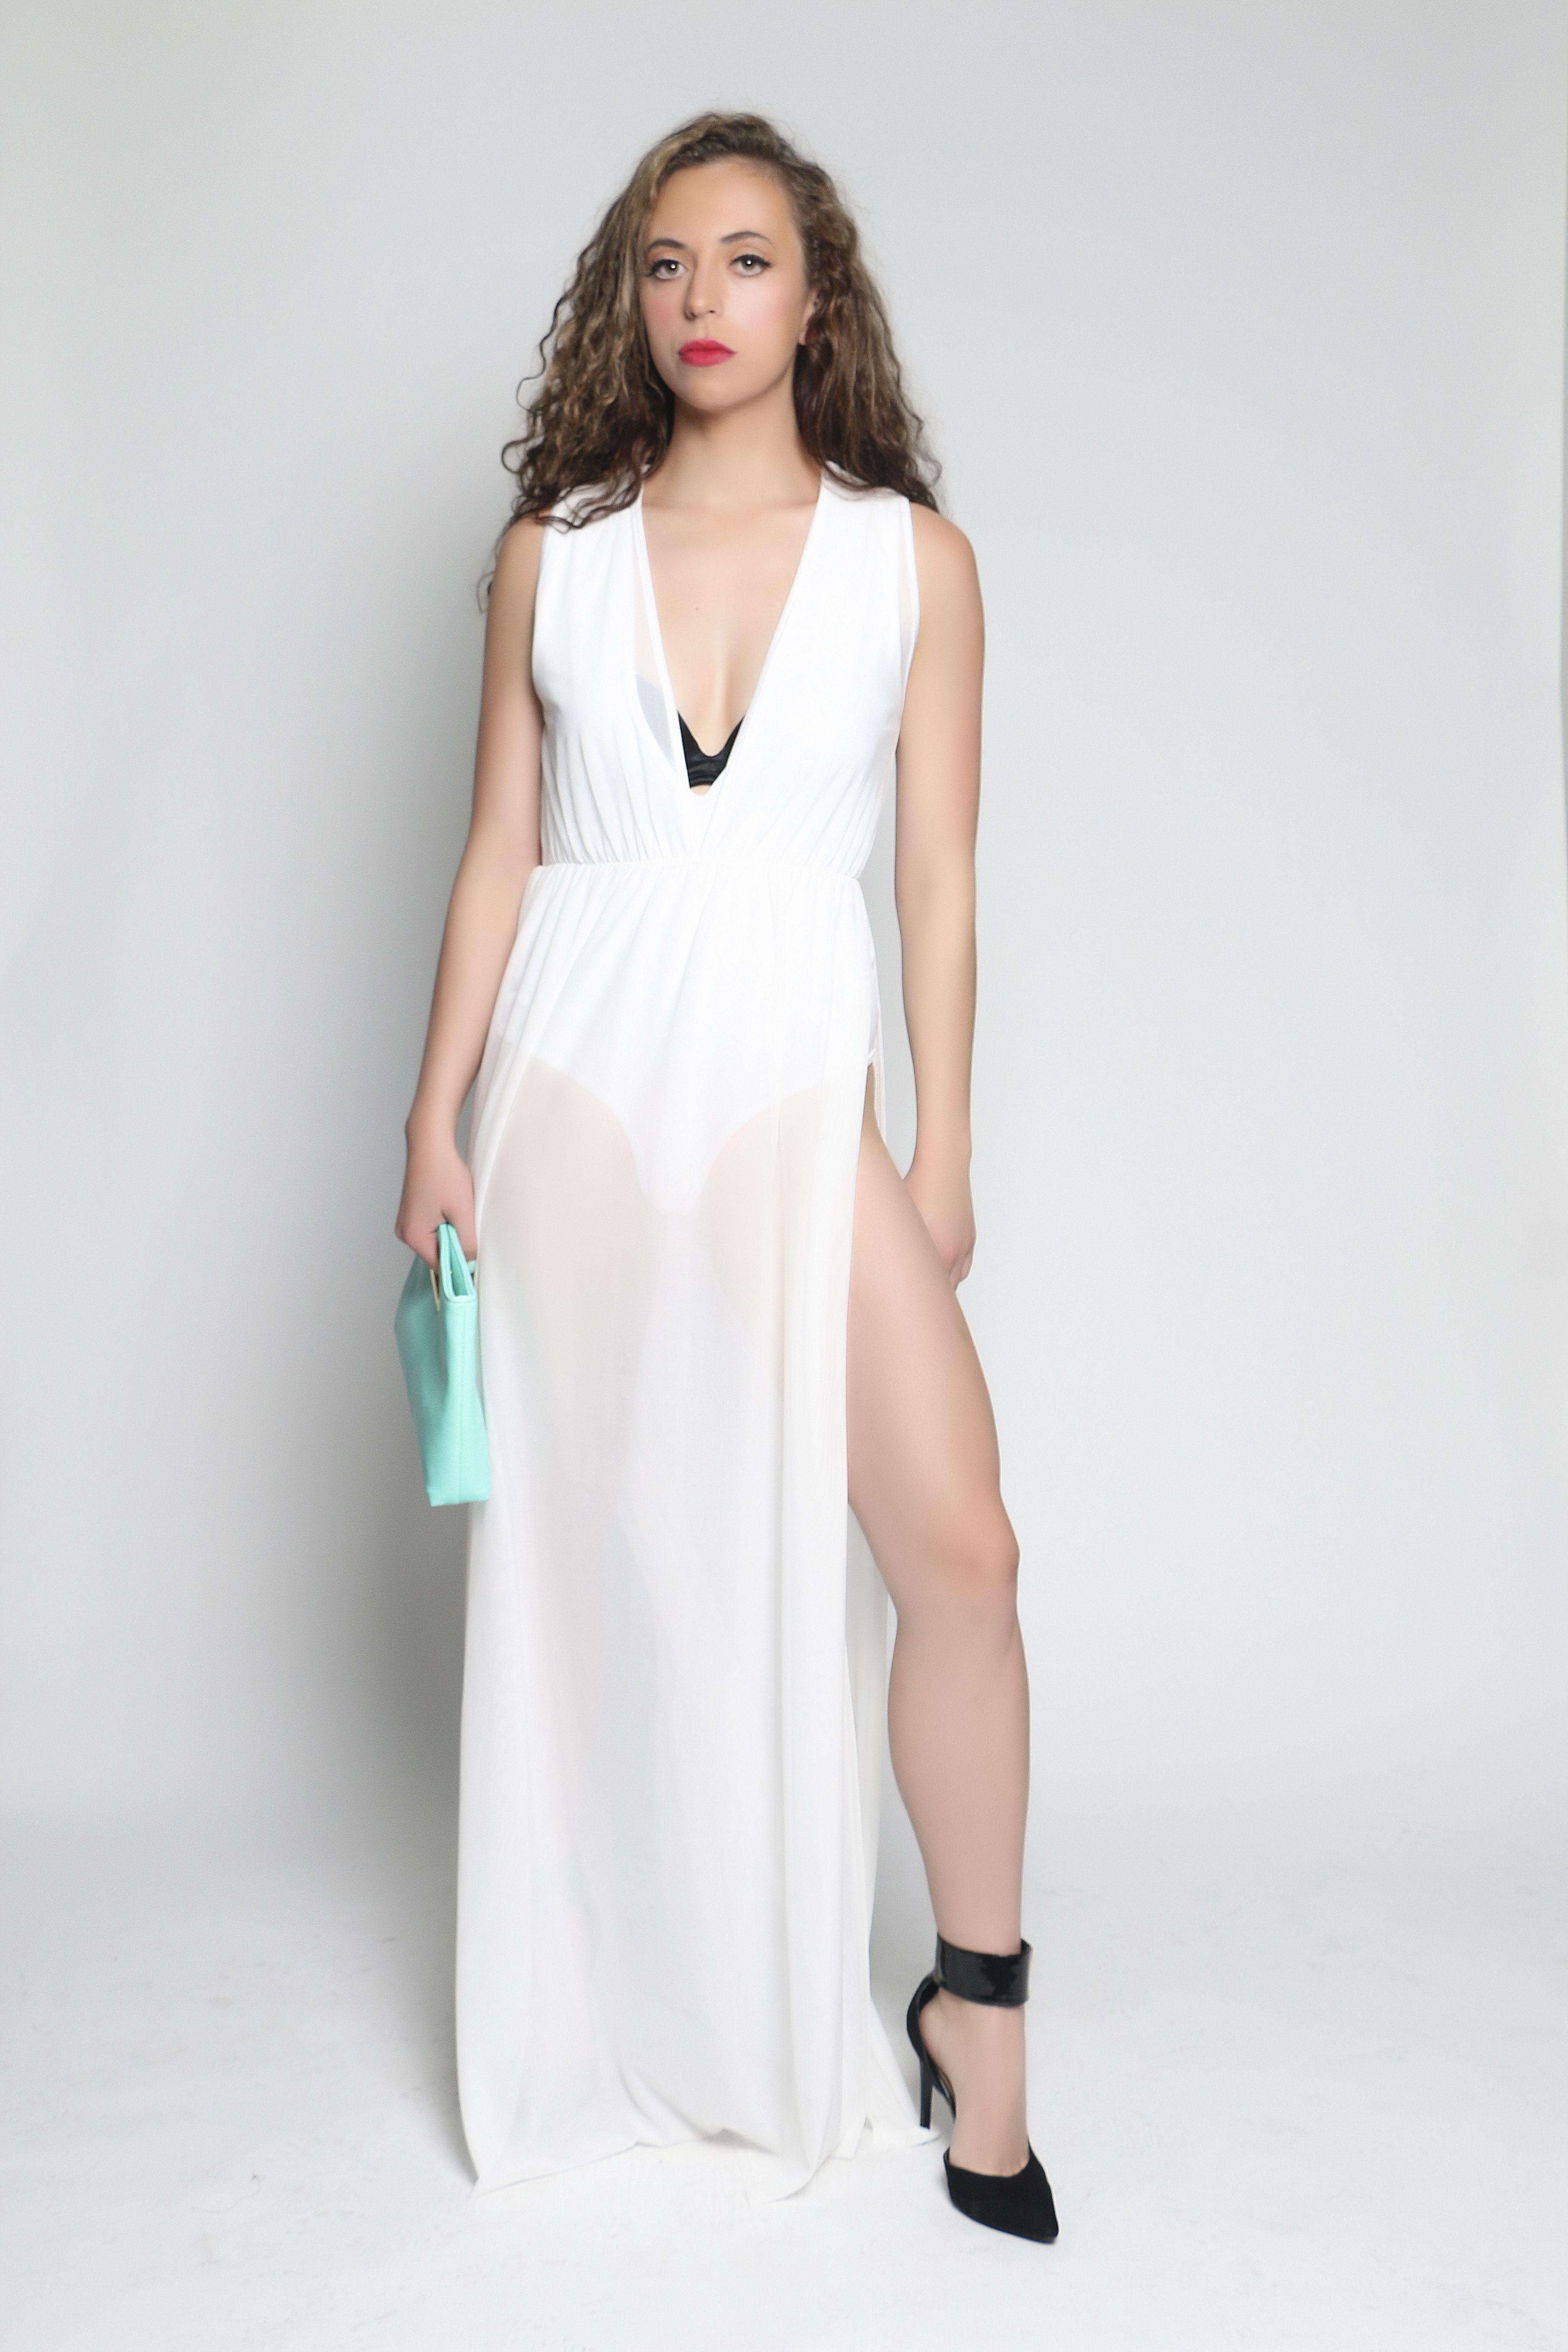 White beach dress dresses pinterest white beach dresses